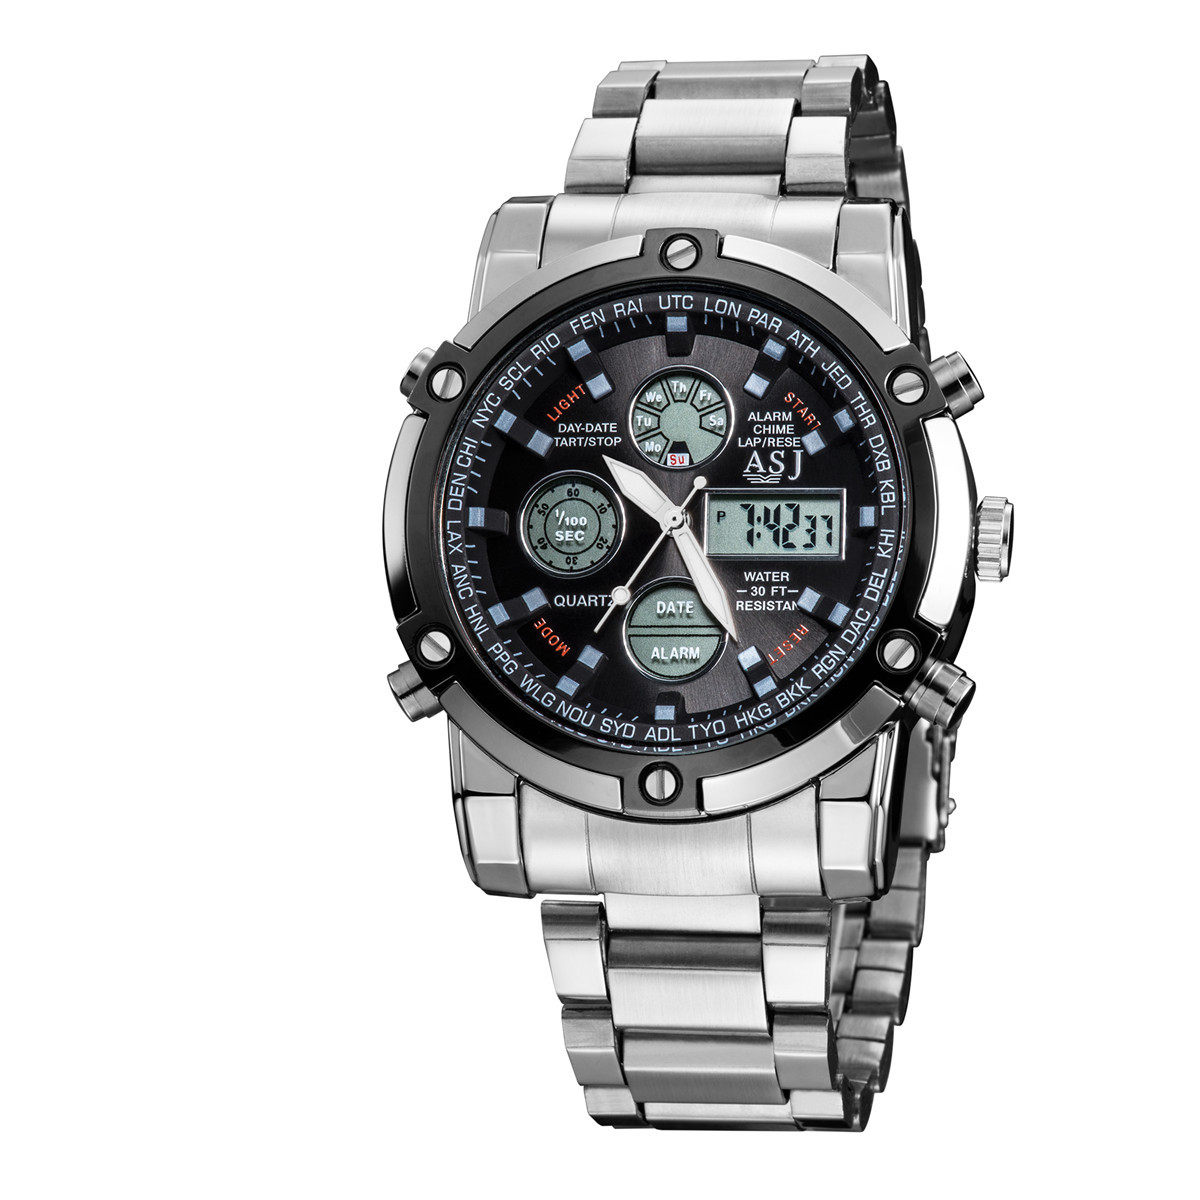 Watches Men Luxury Brand Asj Male Clock Digital Quartz